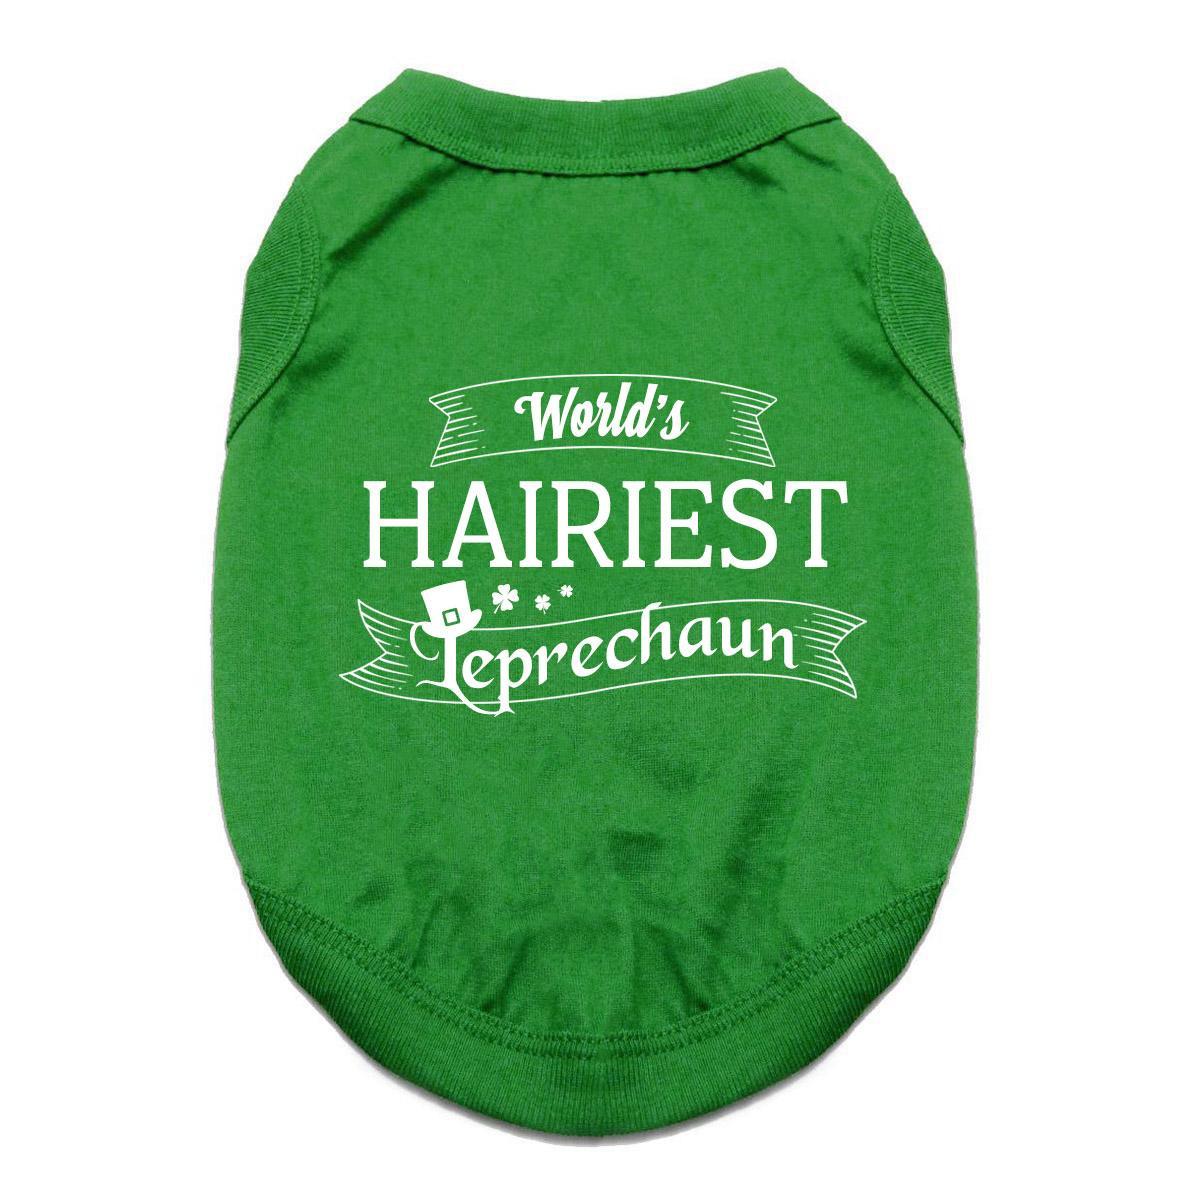 World's Hairiest Leprechaun Dog Shirt - Green